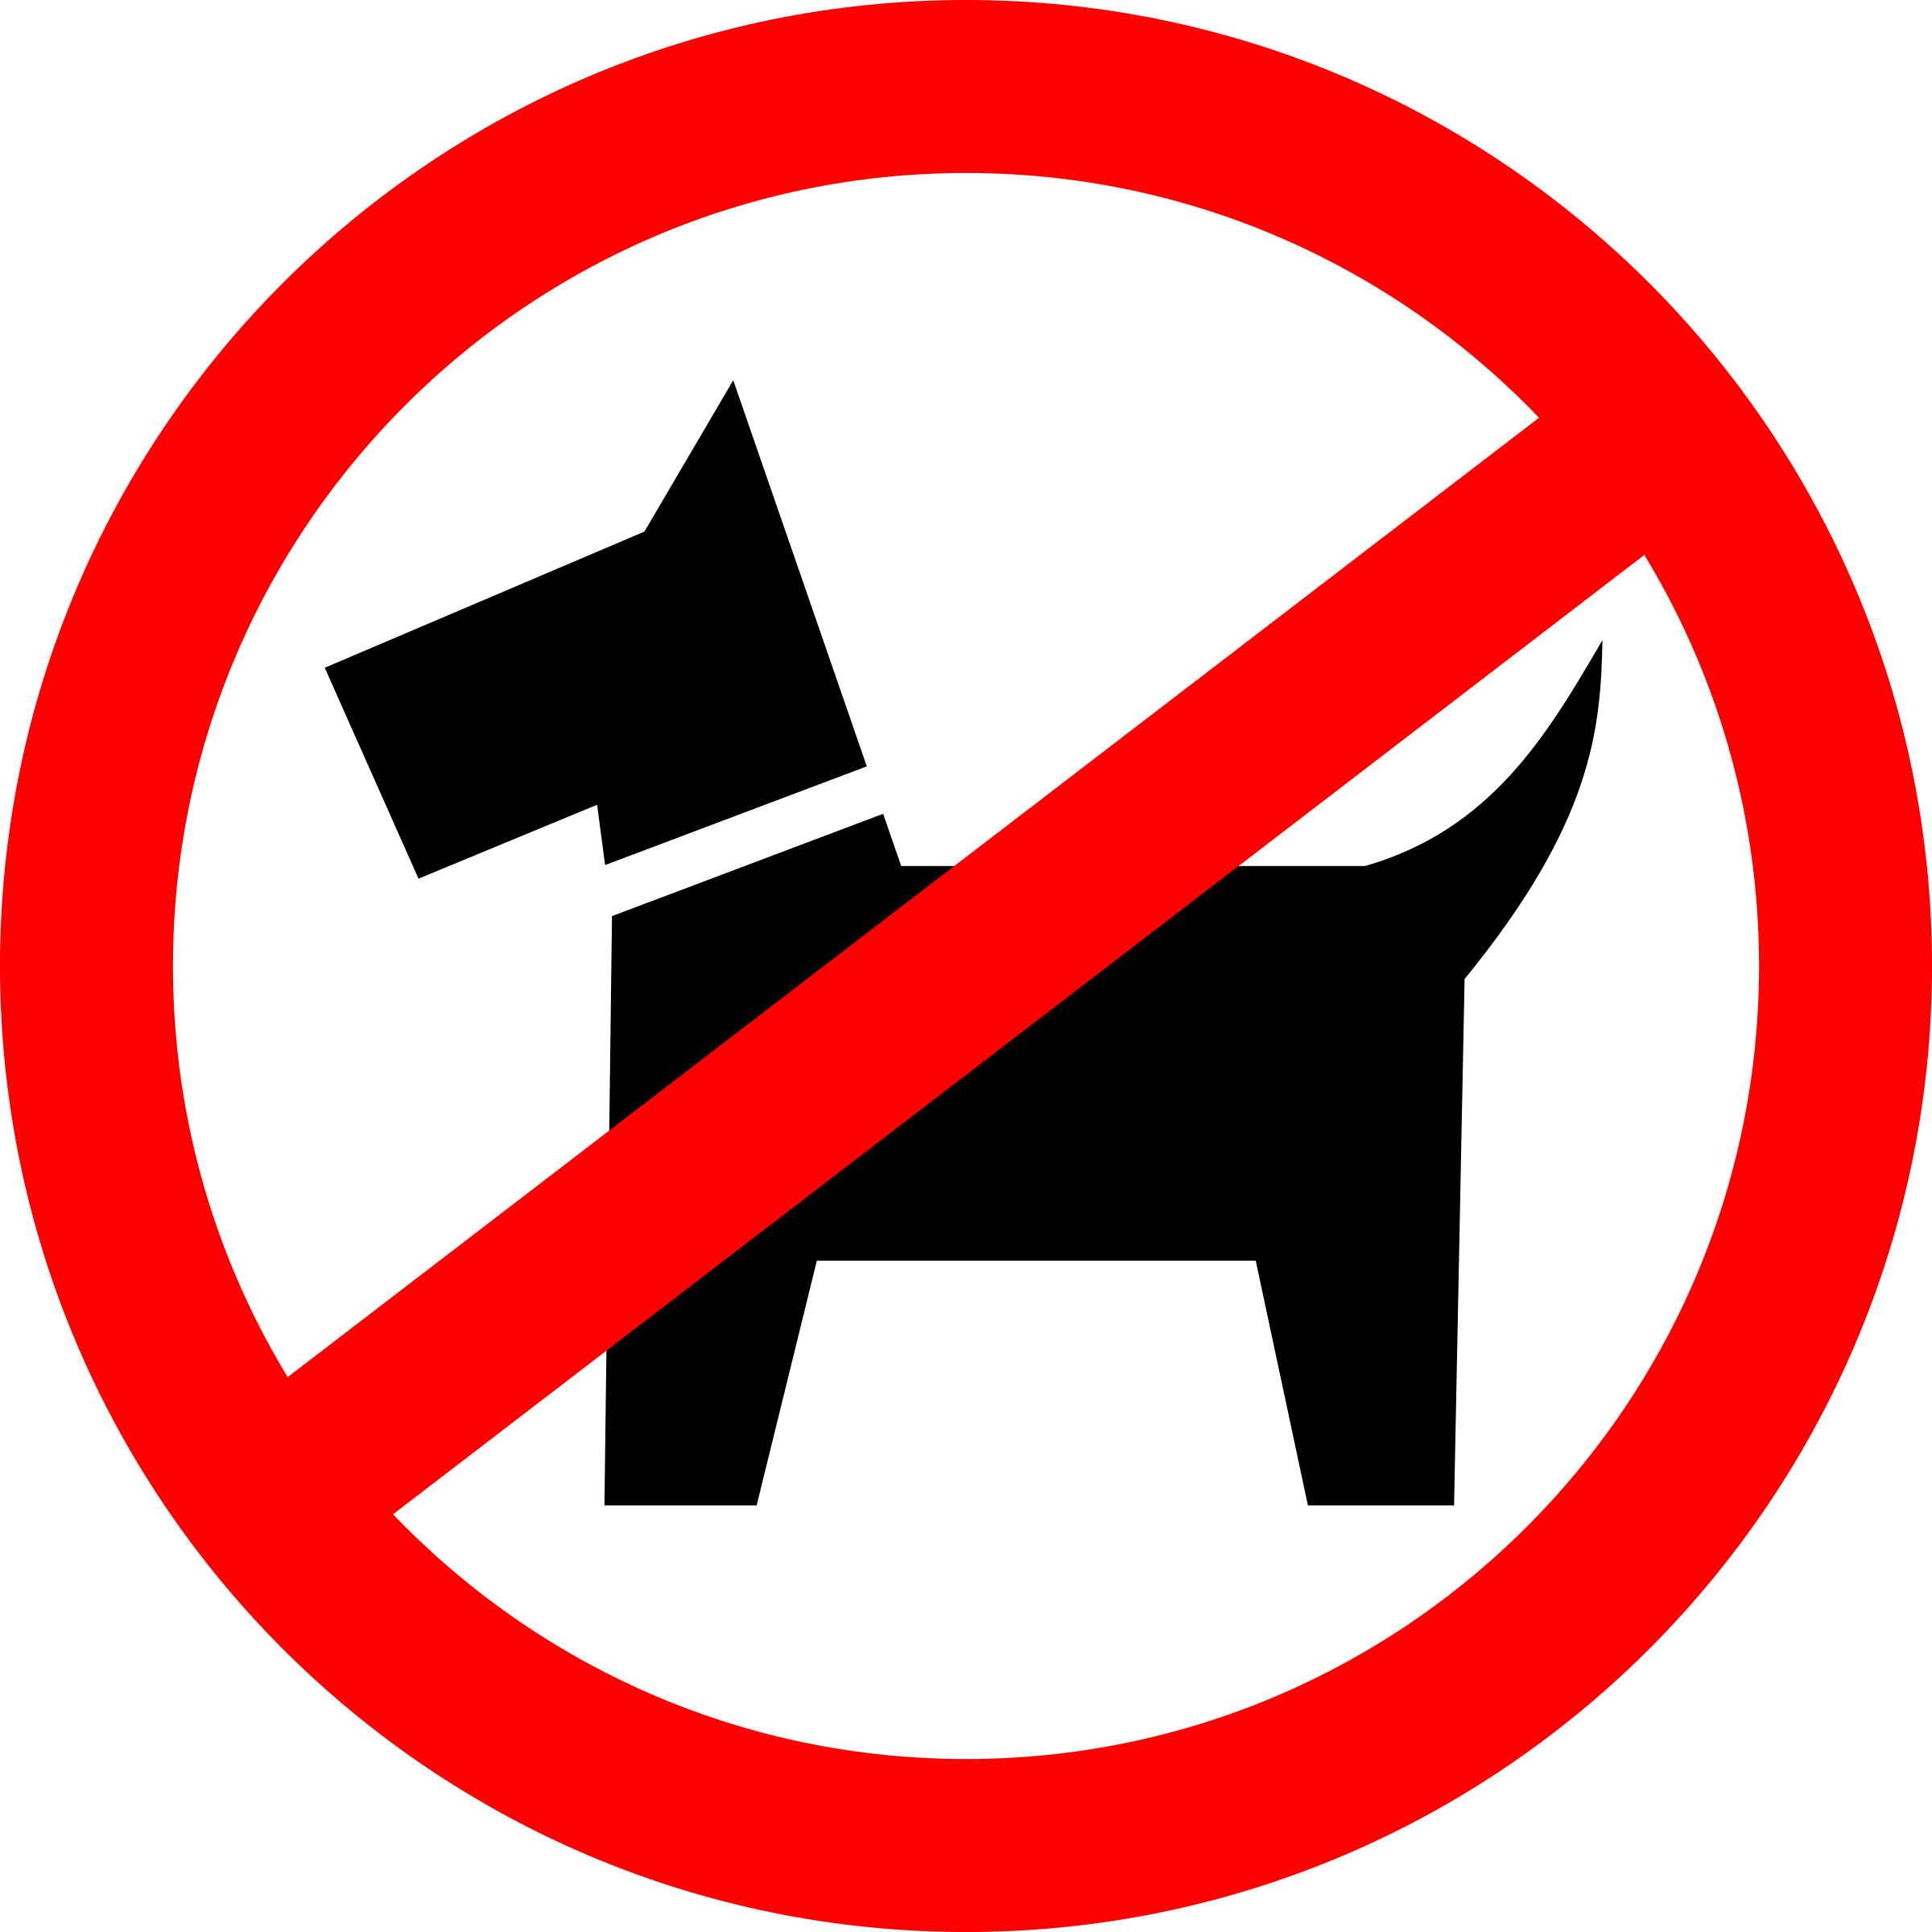 Dog signs clipart banner transparent Clipart - Dog walking is prohibited banner transparent